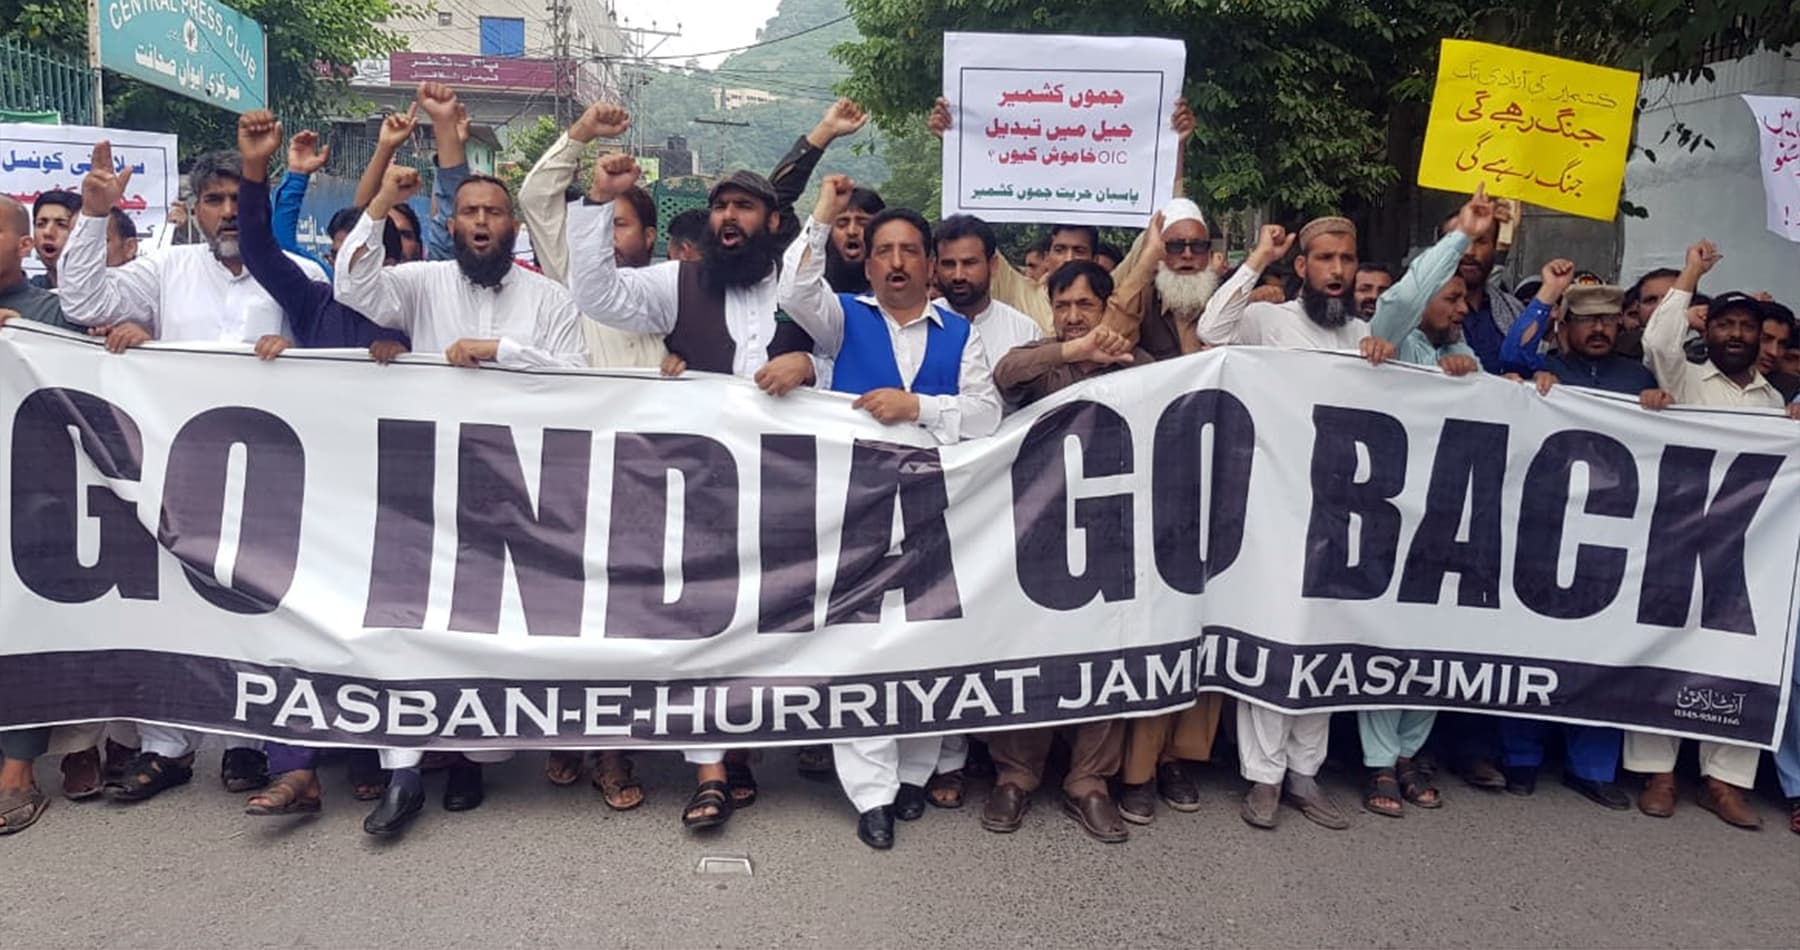 Civil society activists chant slogans at a rally organised by Pasban-e-Hurriyat Jammu Kashmir in Muzaffarabad. — Photo by Tariq Naqash